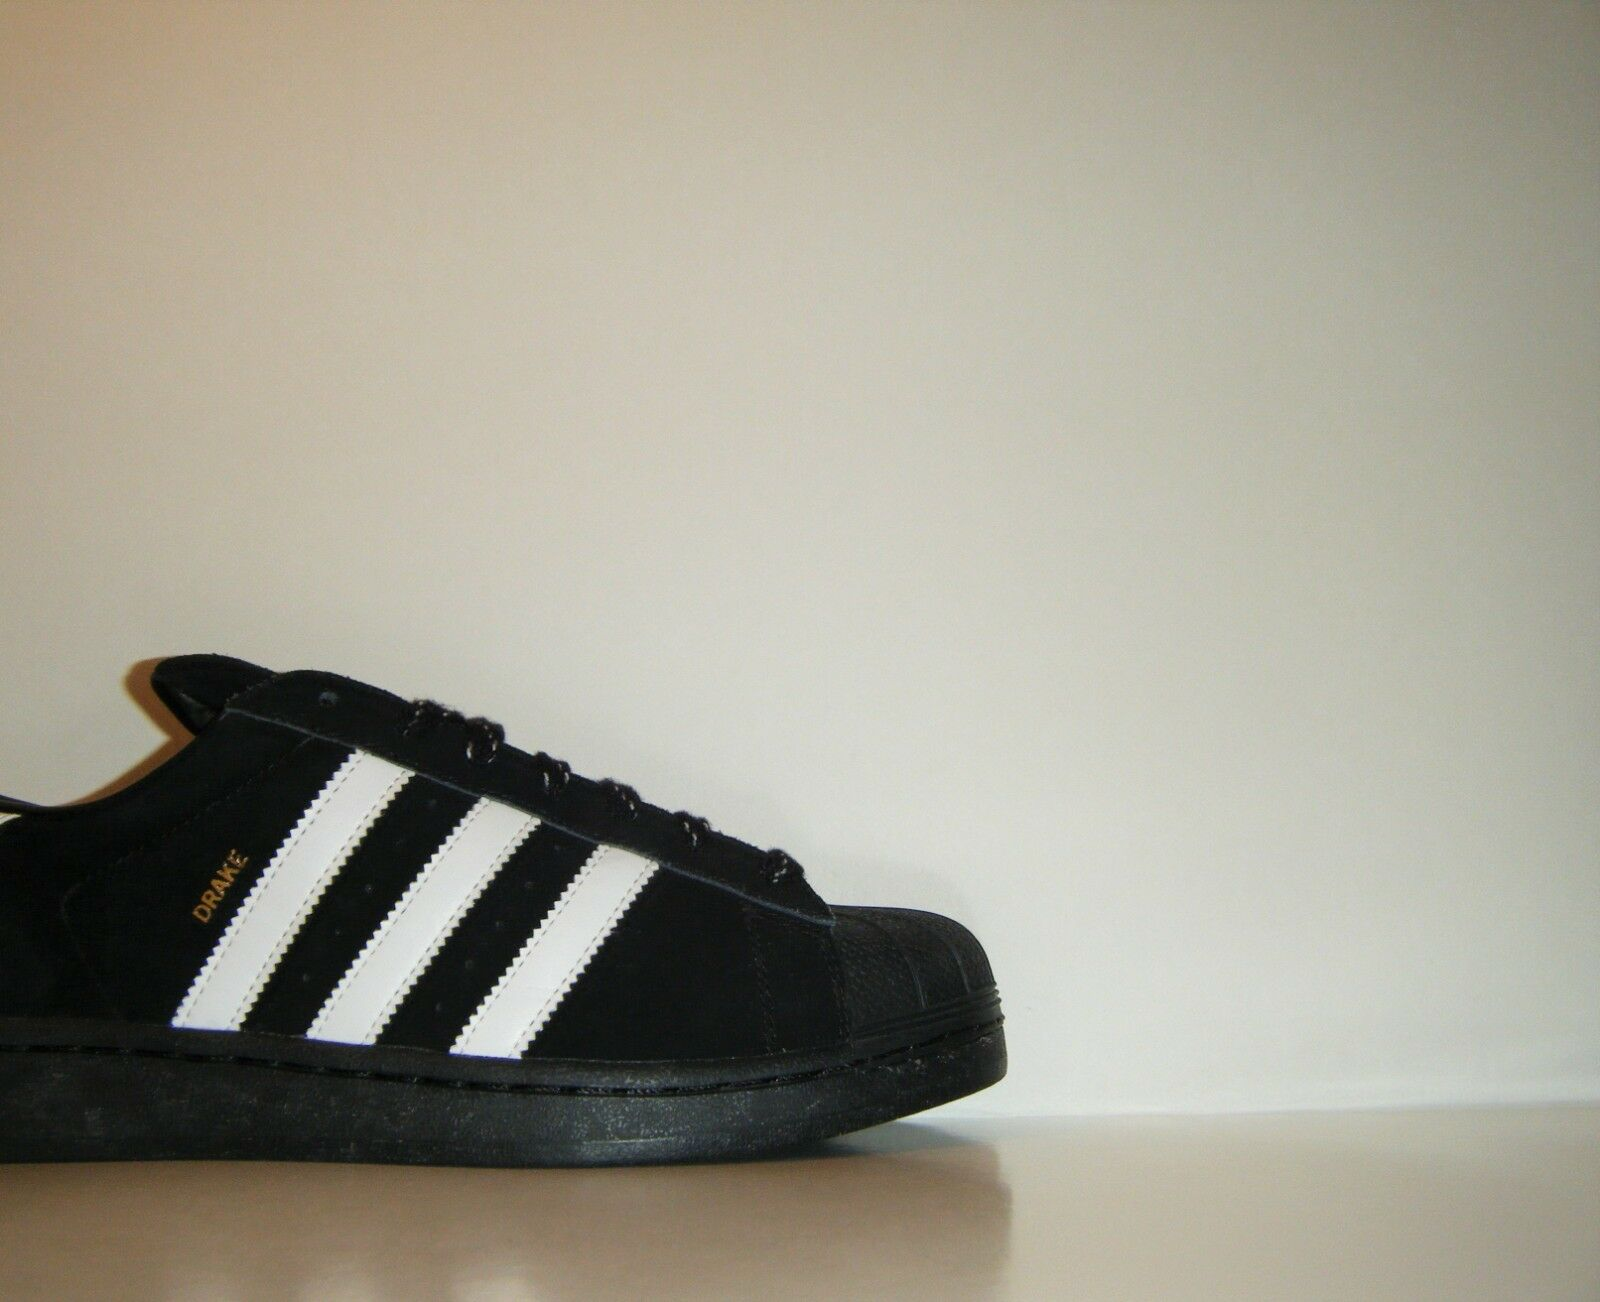 2014 Adidas Originals Superstar RT DRAKE JONES PROMO SAMPLE 9 Run DMC OvO C77410